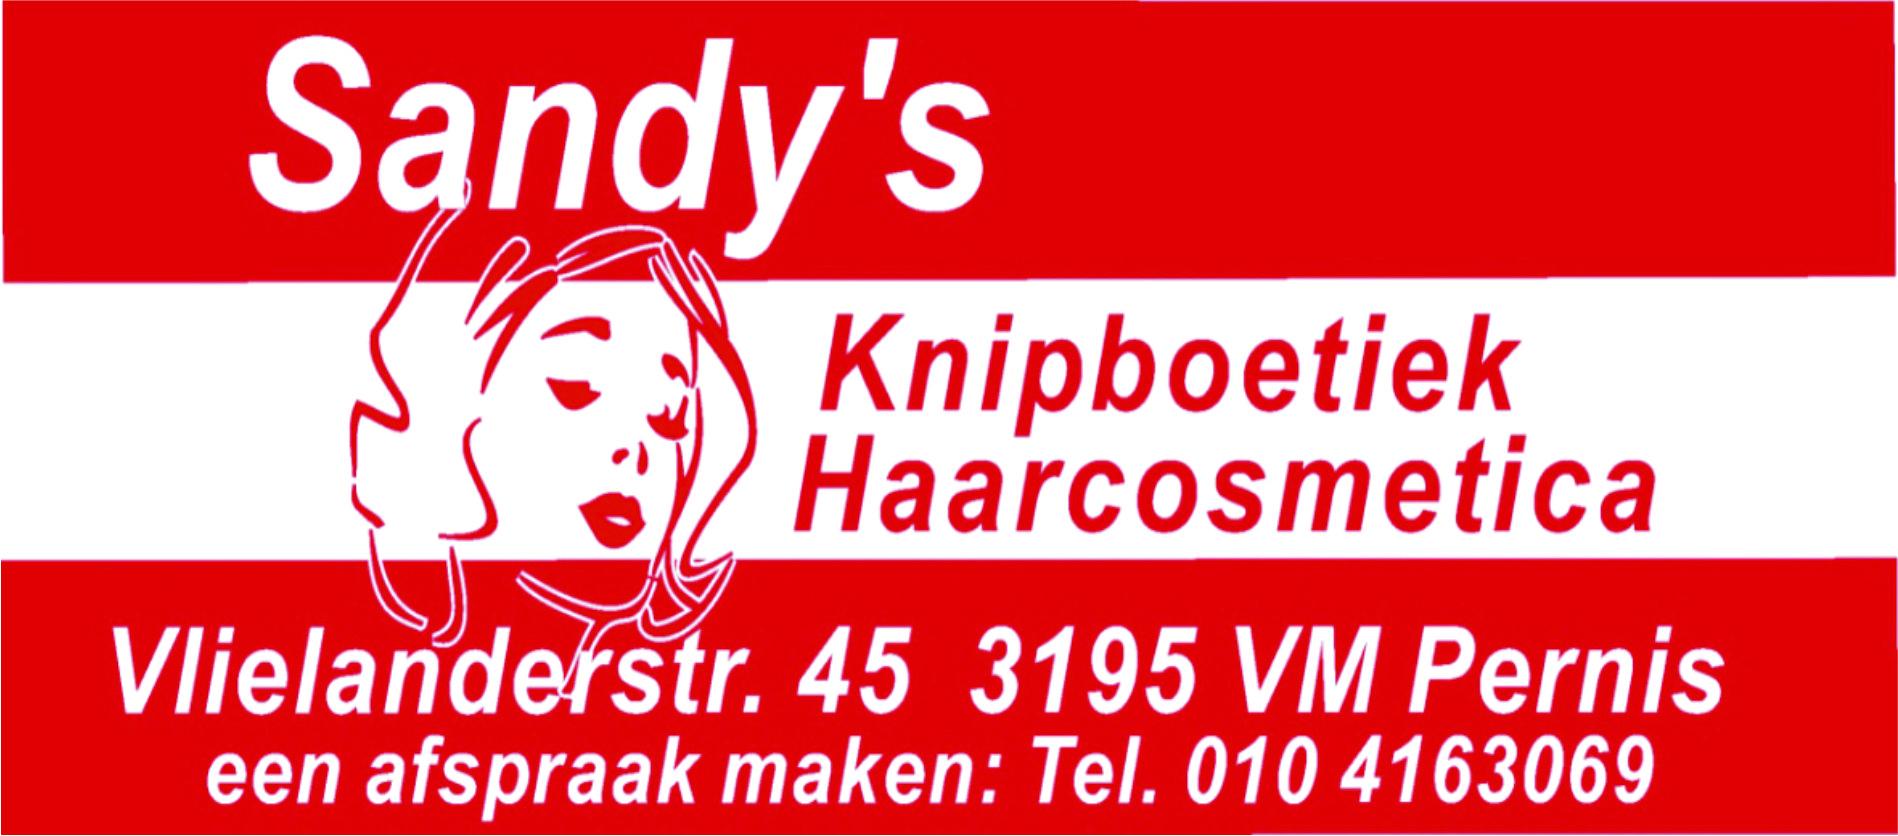 Kapper Pernis - Kapsalon Sandy's Knipboetiek